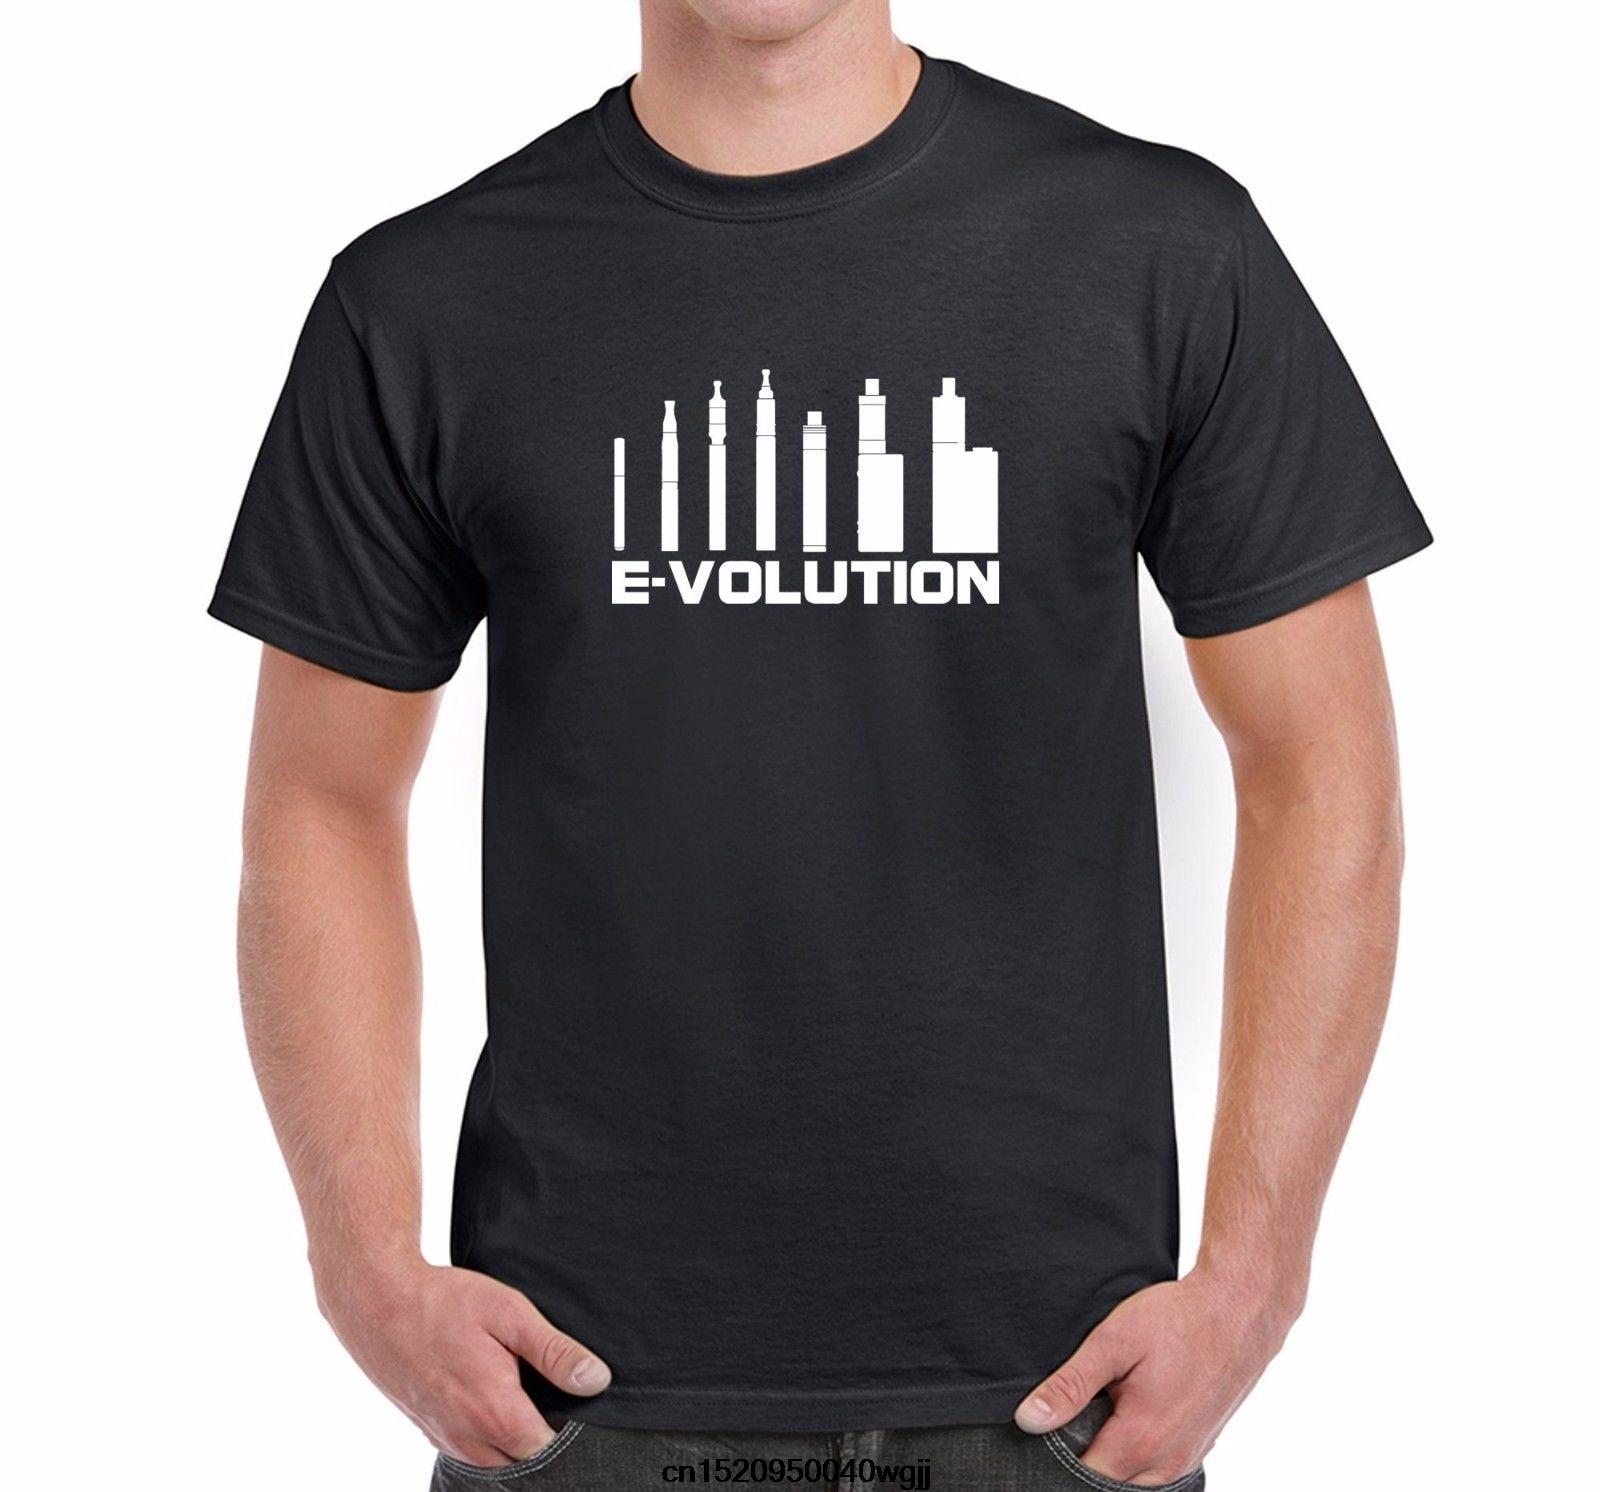 Men's Novelty Vaping T-Shirt Evolution of Vaping Pens Mods Short Sleeves 100% Cotton Summer O-Neck Hipster Tops T Shirt